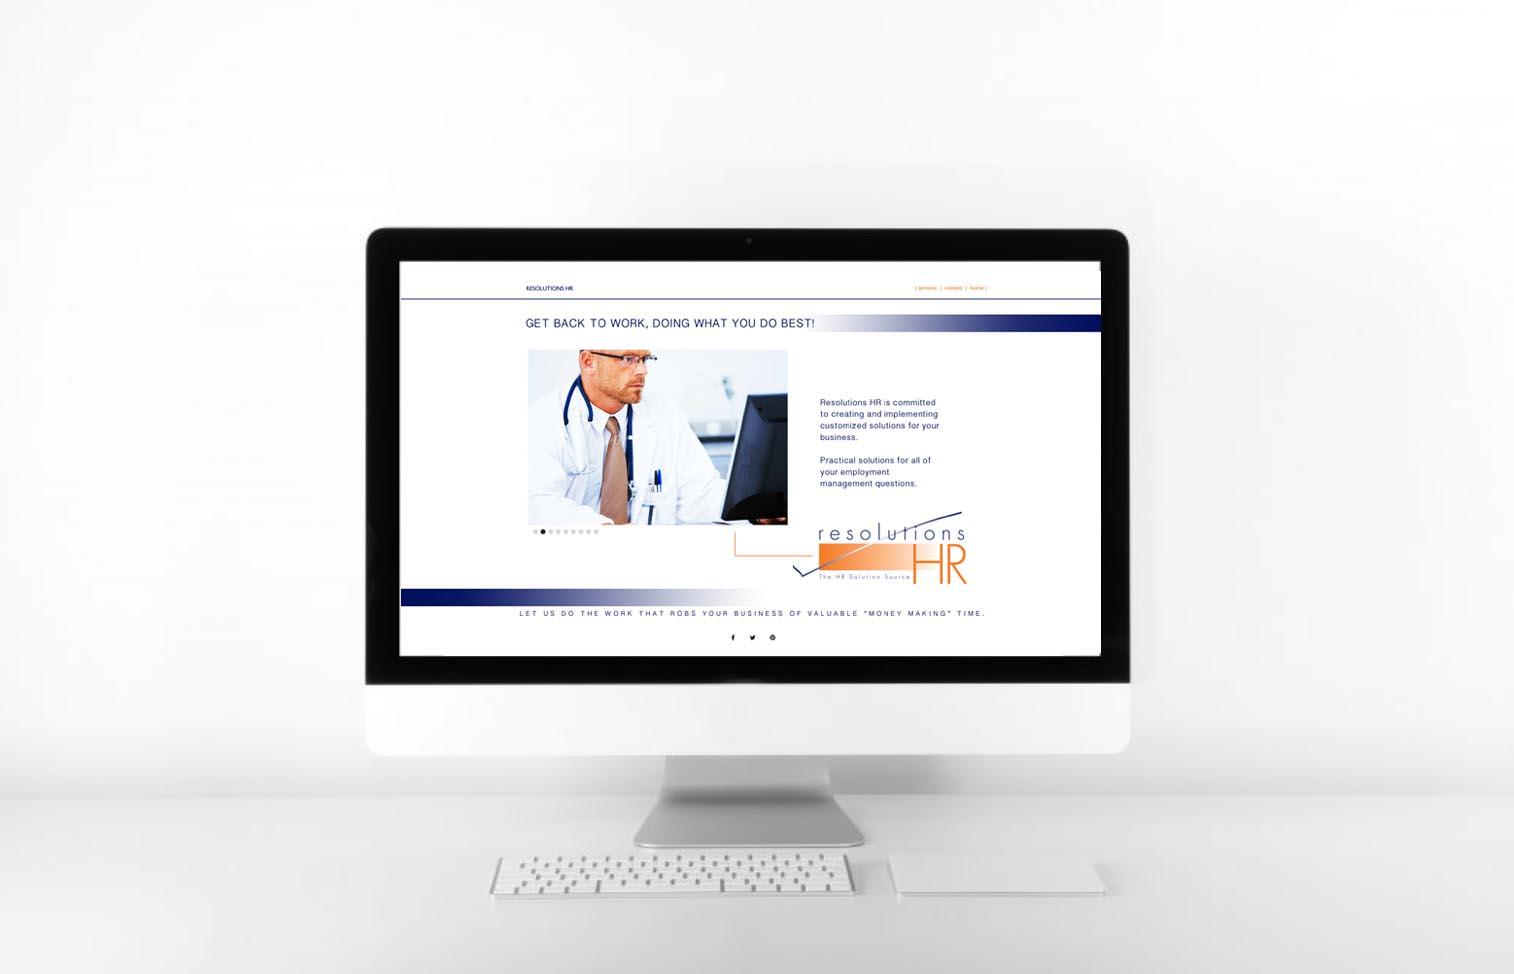 desktop-hr-firm-website-design-company-2